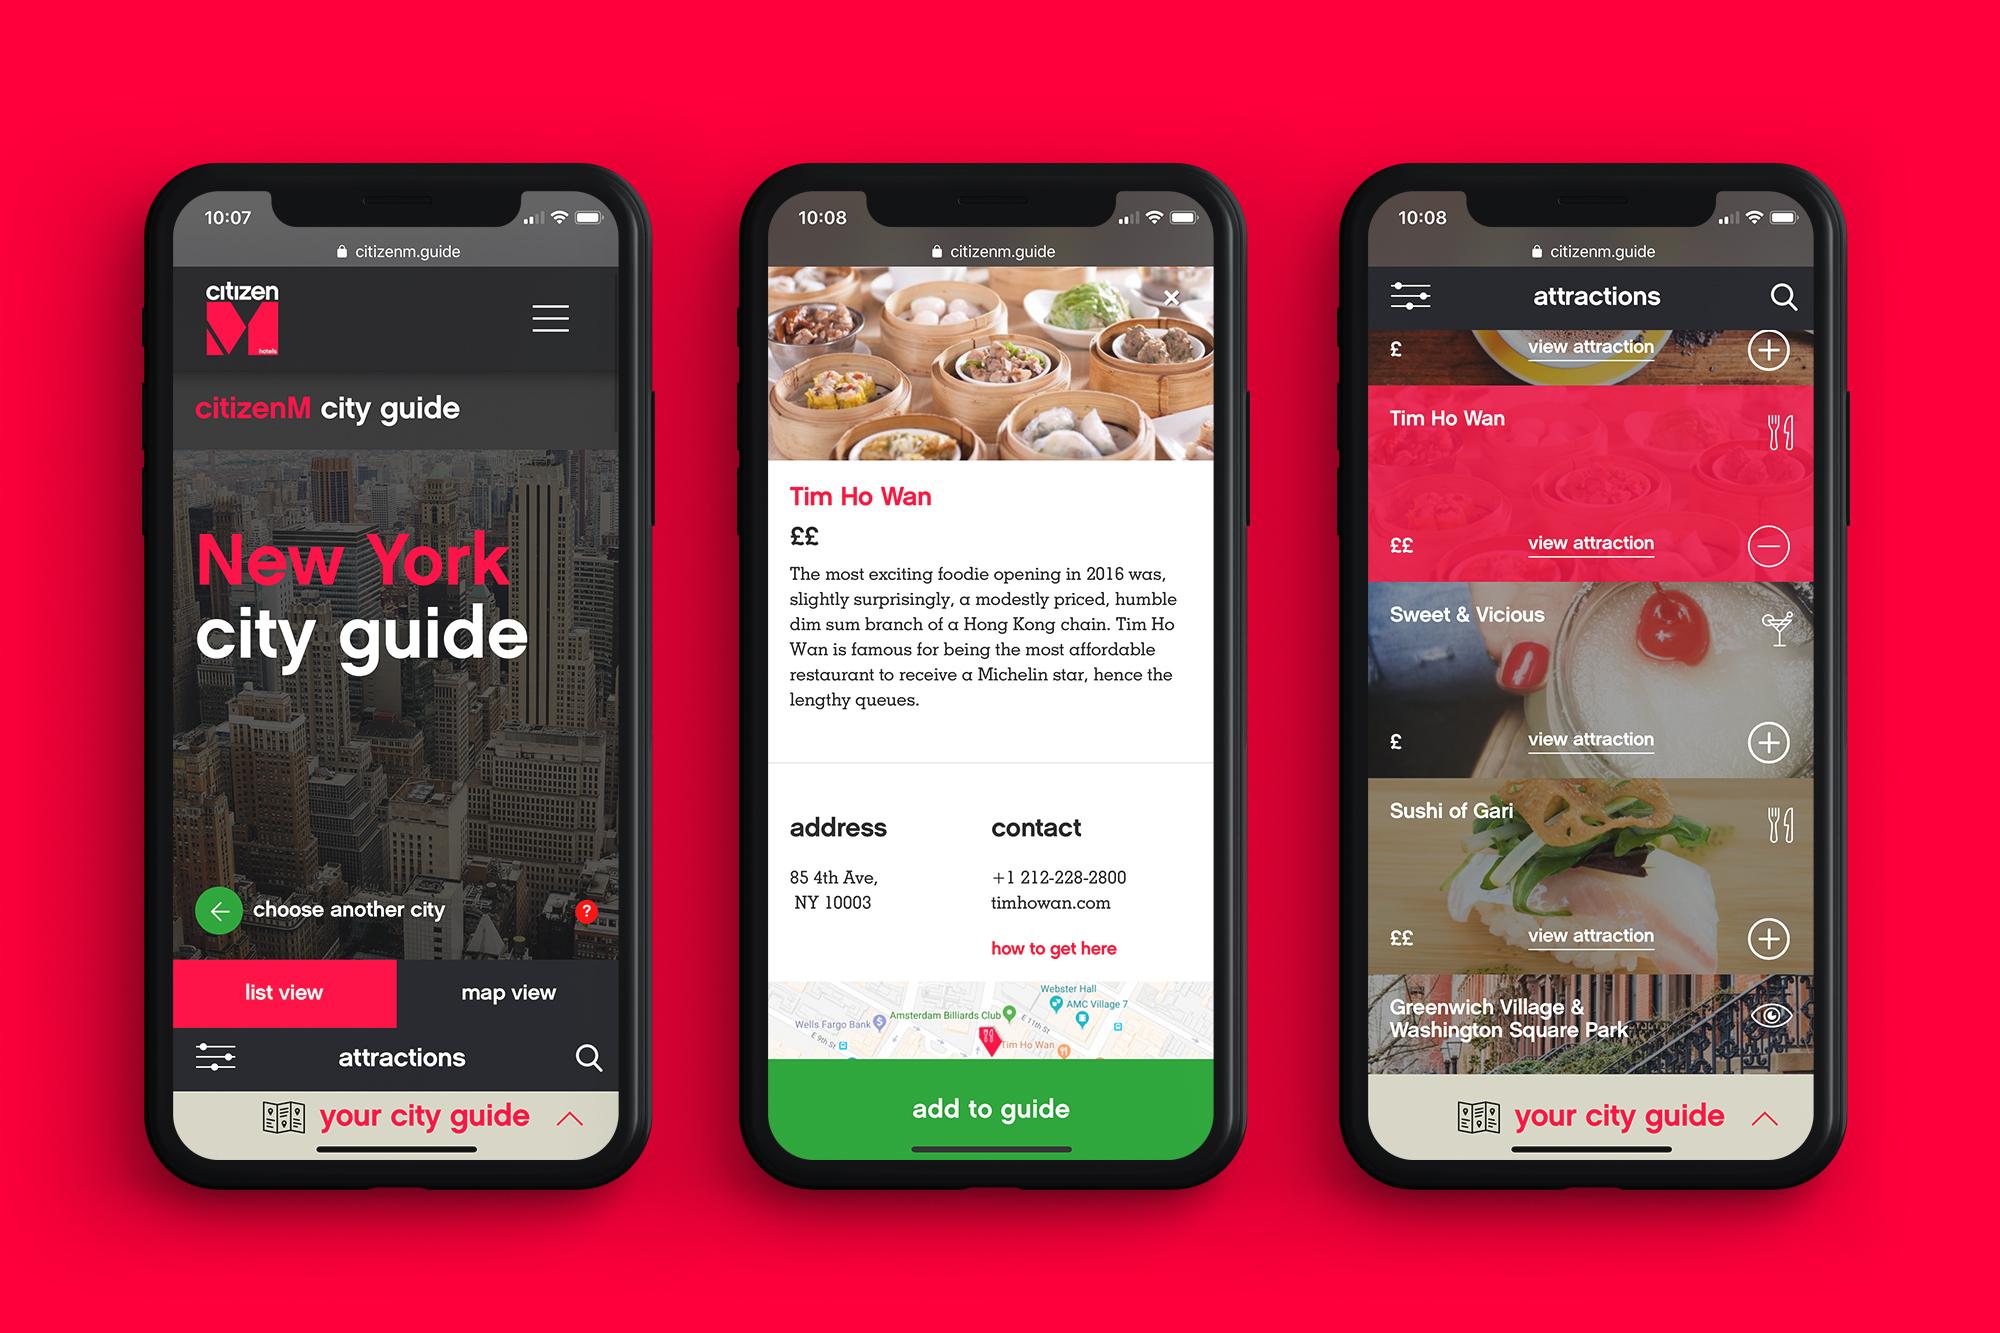 Web Design - citizenM - City Guides